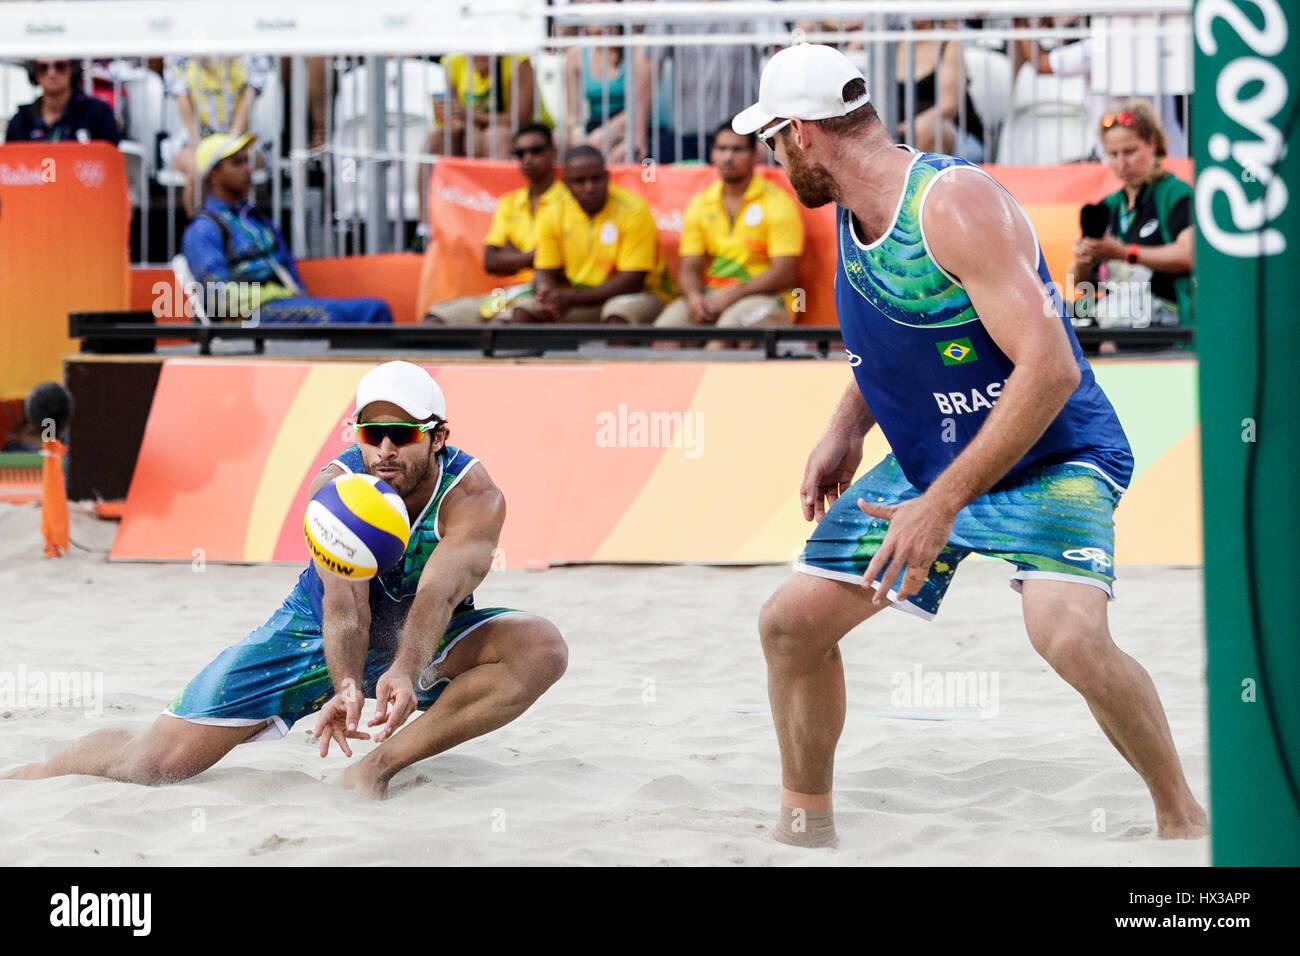 Rio de Janeiro, Brésil. 15 août 2016 Alison Cerutti - Bruno Schmidt (BRA) vs Phil Dalhausser - Nick Lucena Photo Stock